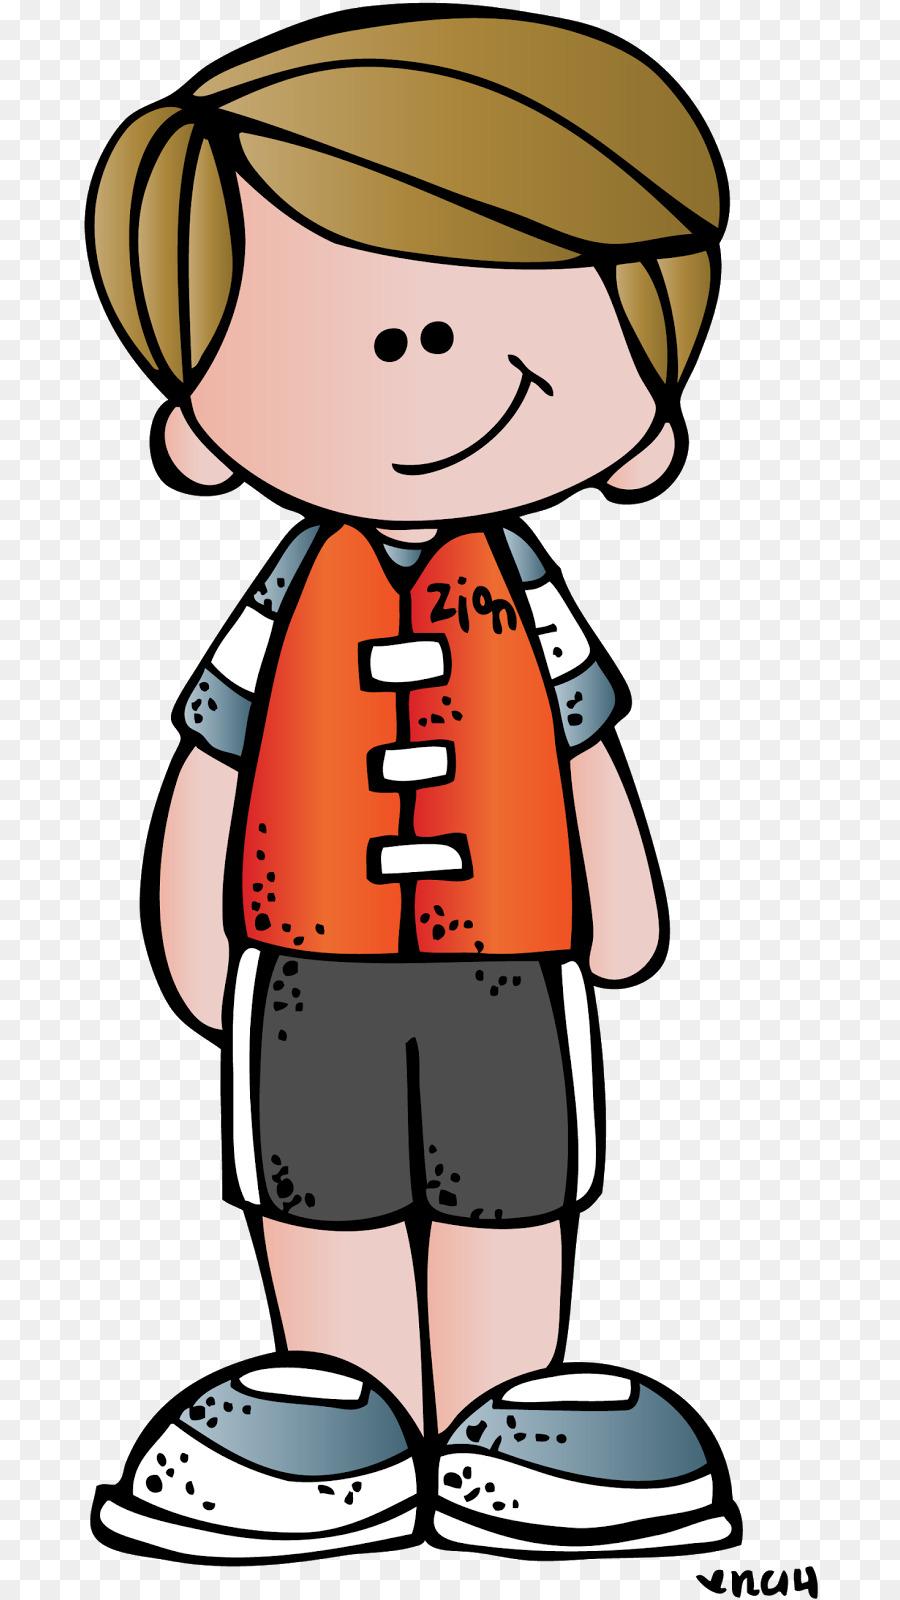 Child cartoon png download. Lds clipart boy